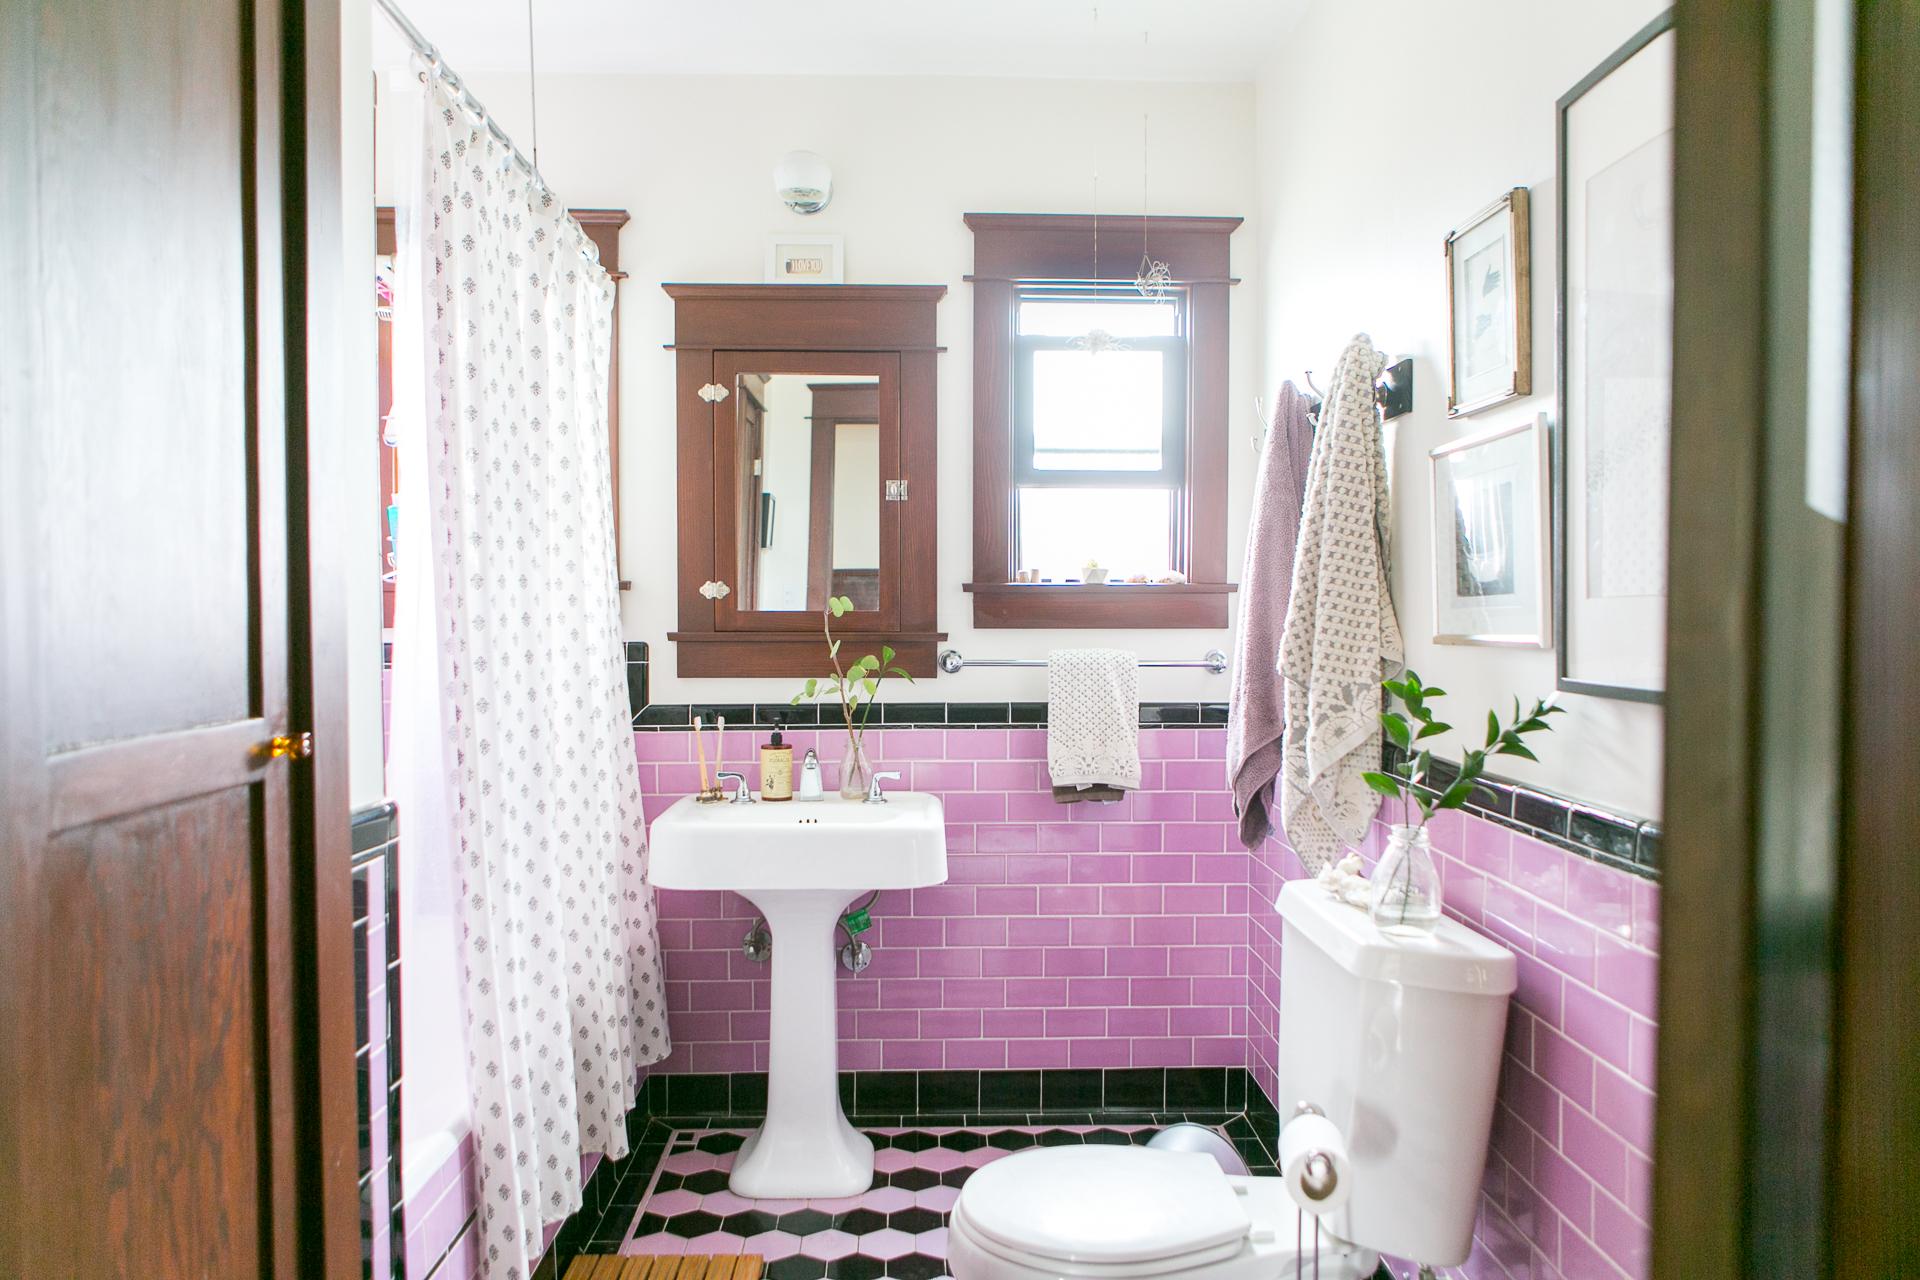 Inspiring Bathrooms With Vintage Tile